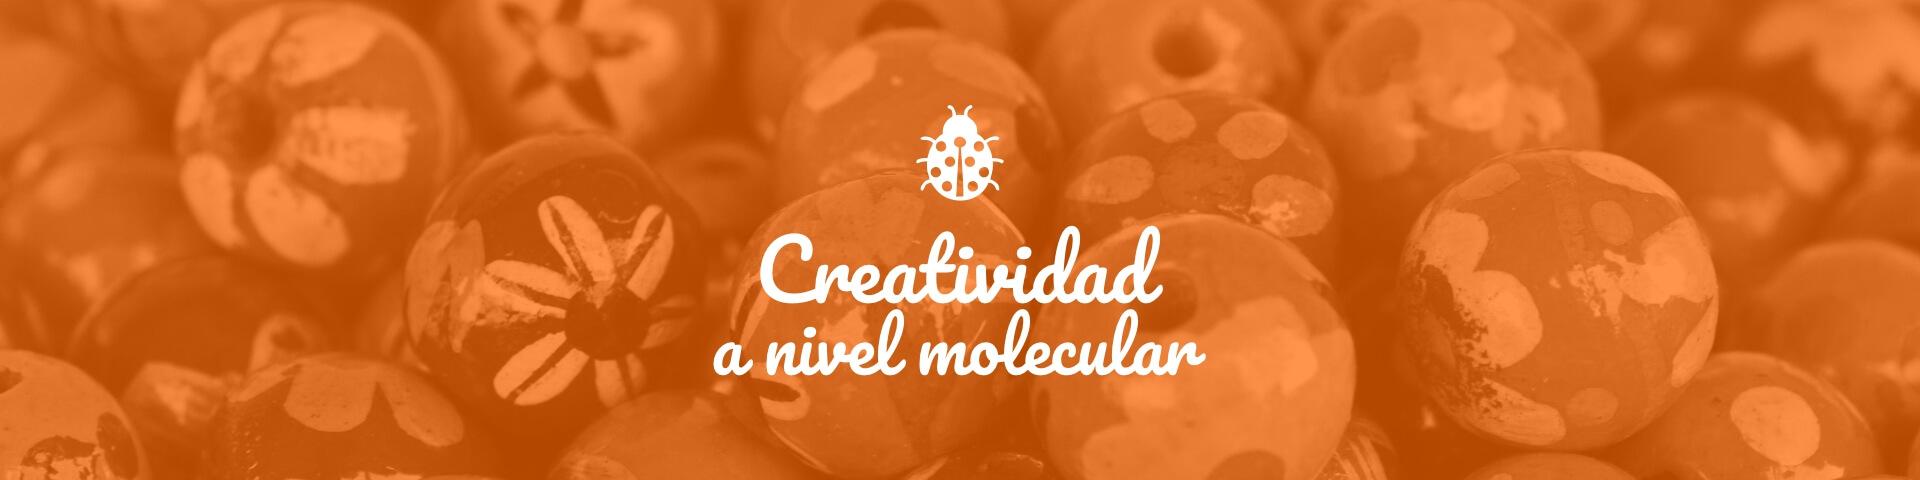 Creatividad a nivel molecular